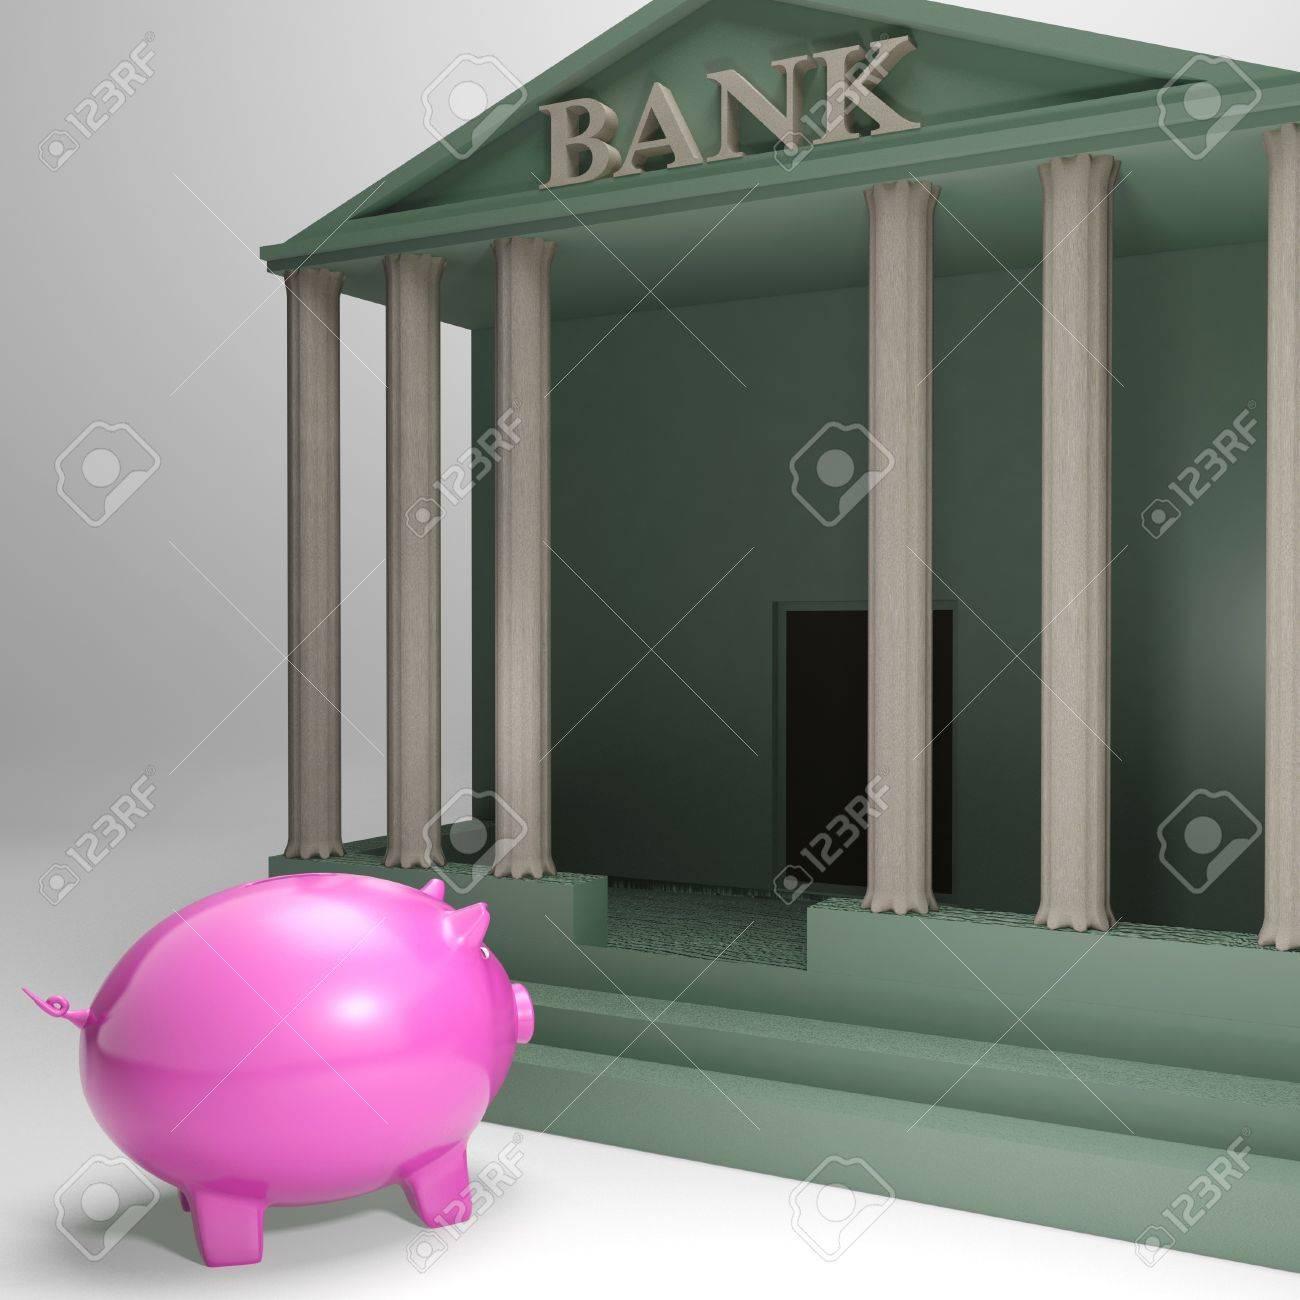 Alaska usa cash advance picture 2